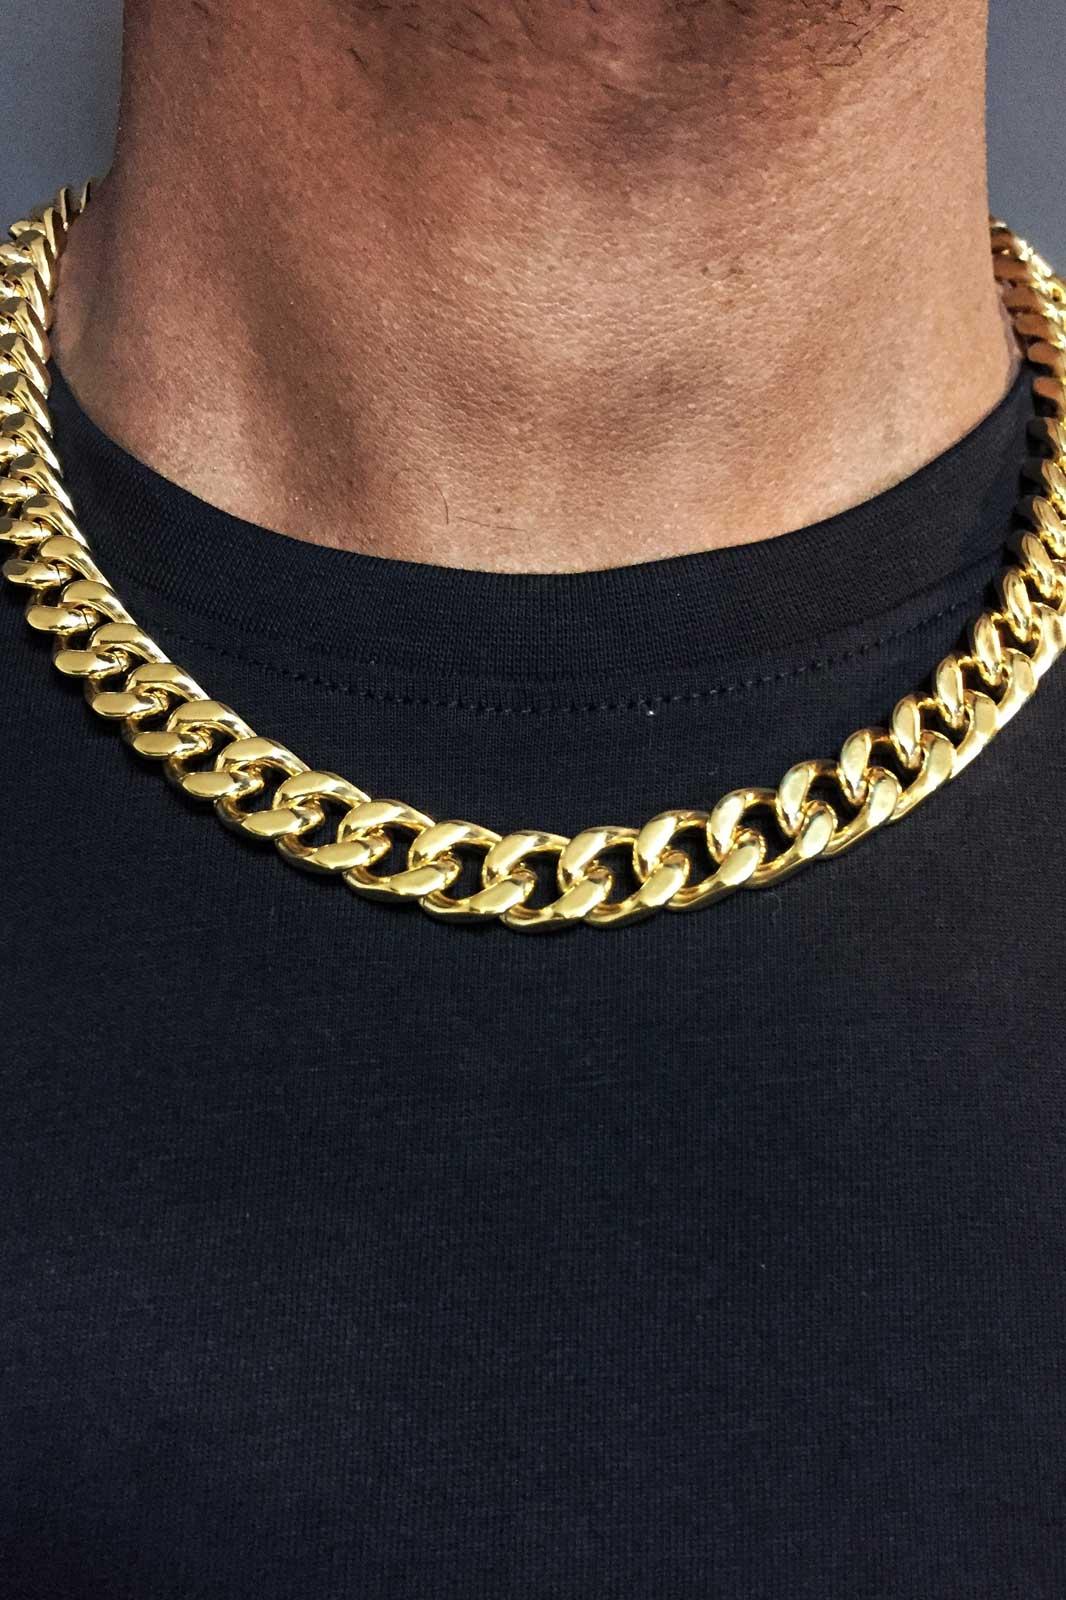 Necklace Moskva Gold på modell